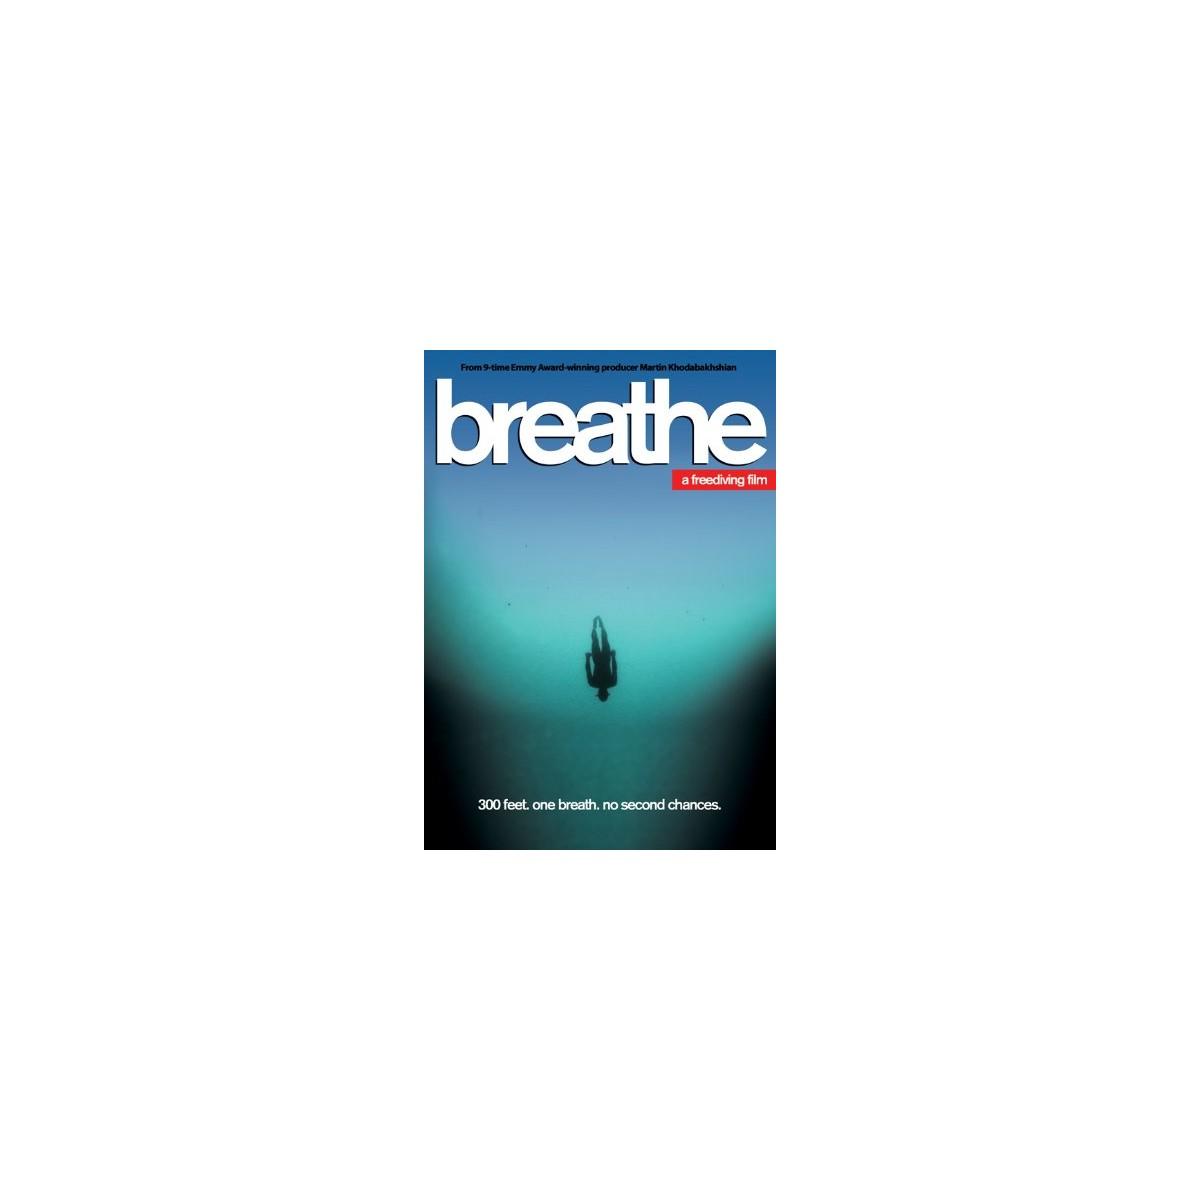 Breathe Documentary DVD